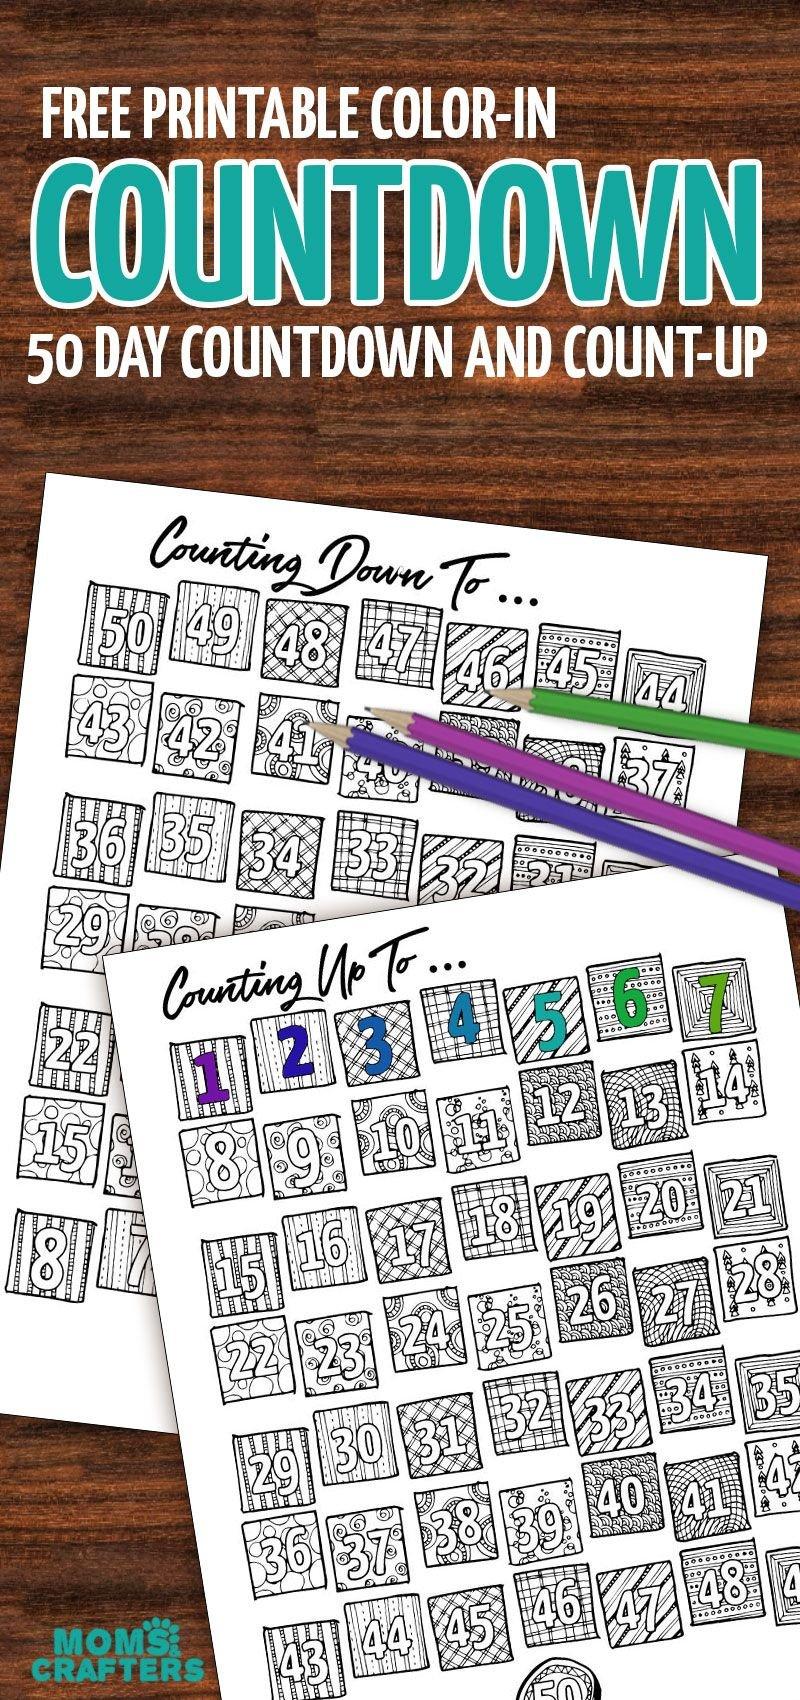 365 Countdown Calendar | Calendar For Planning 365 Day Calendar Counter